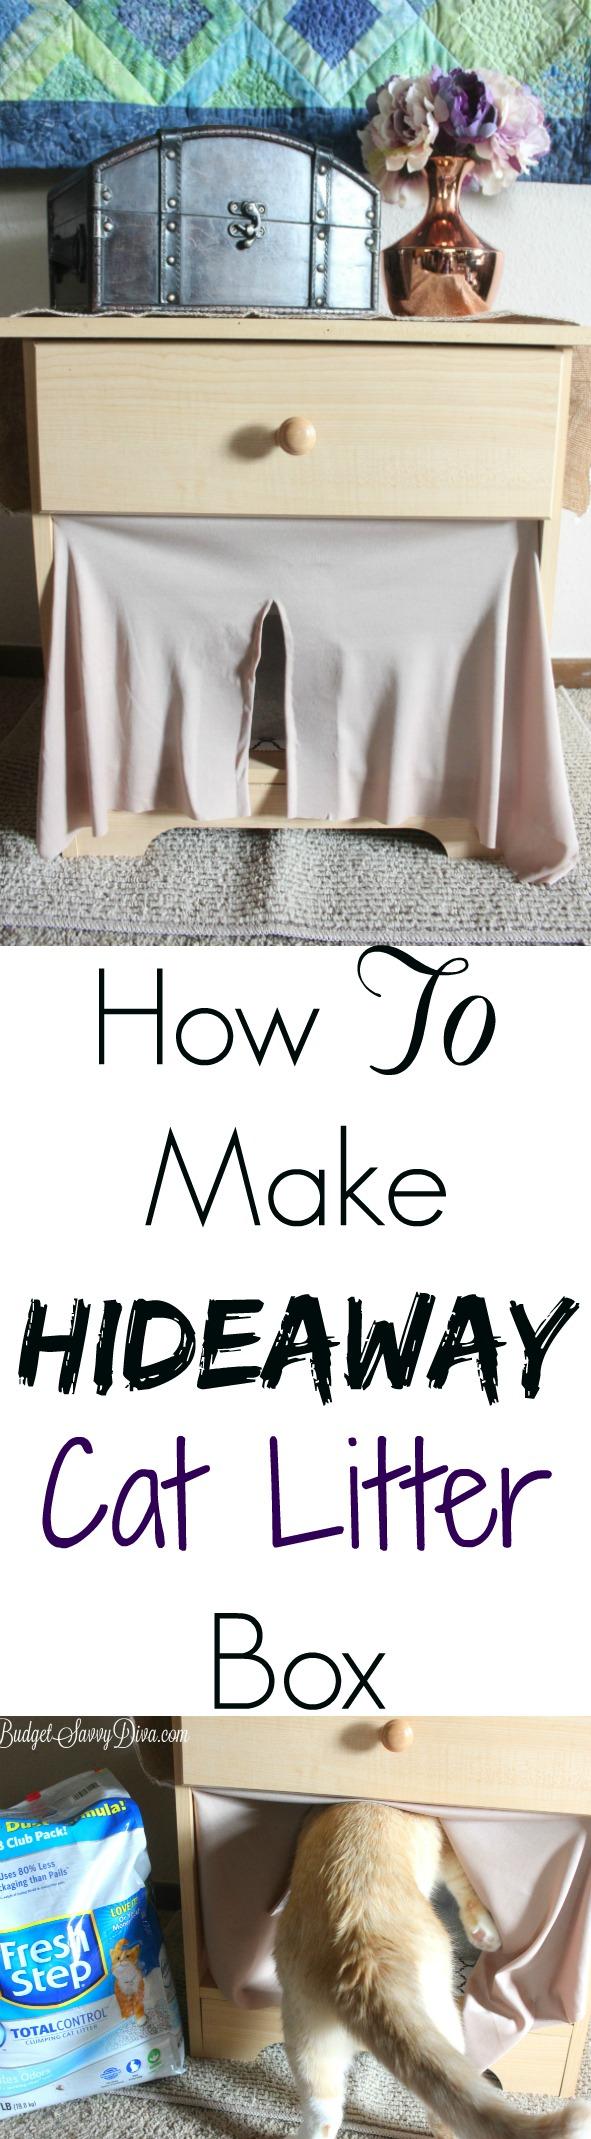 How To Make Hideaway Cat Litter Box